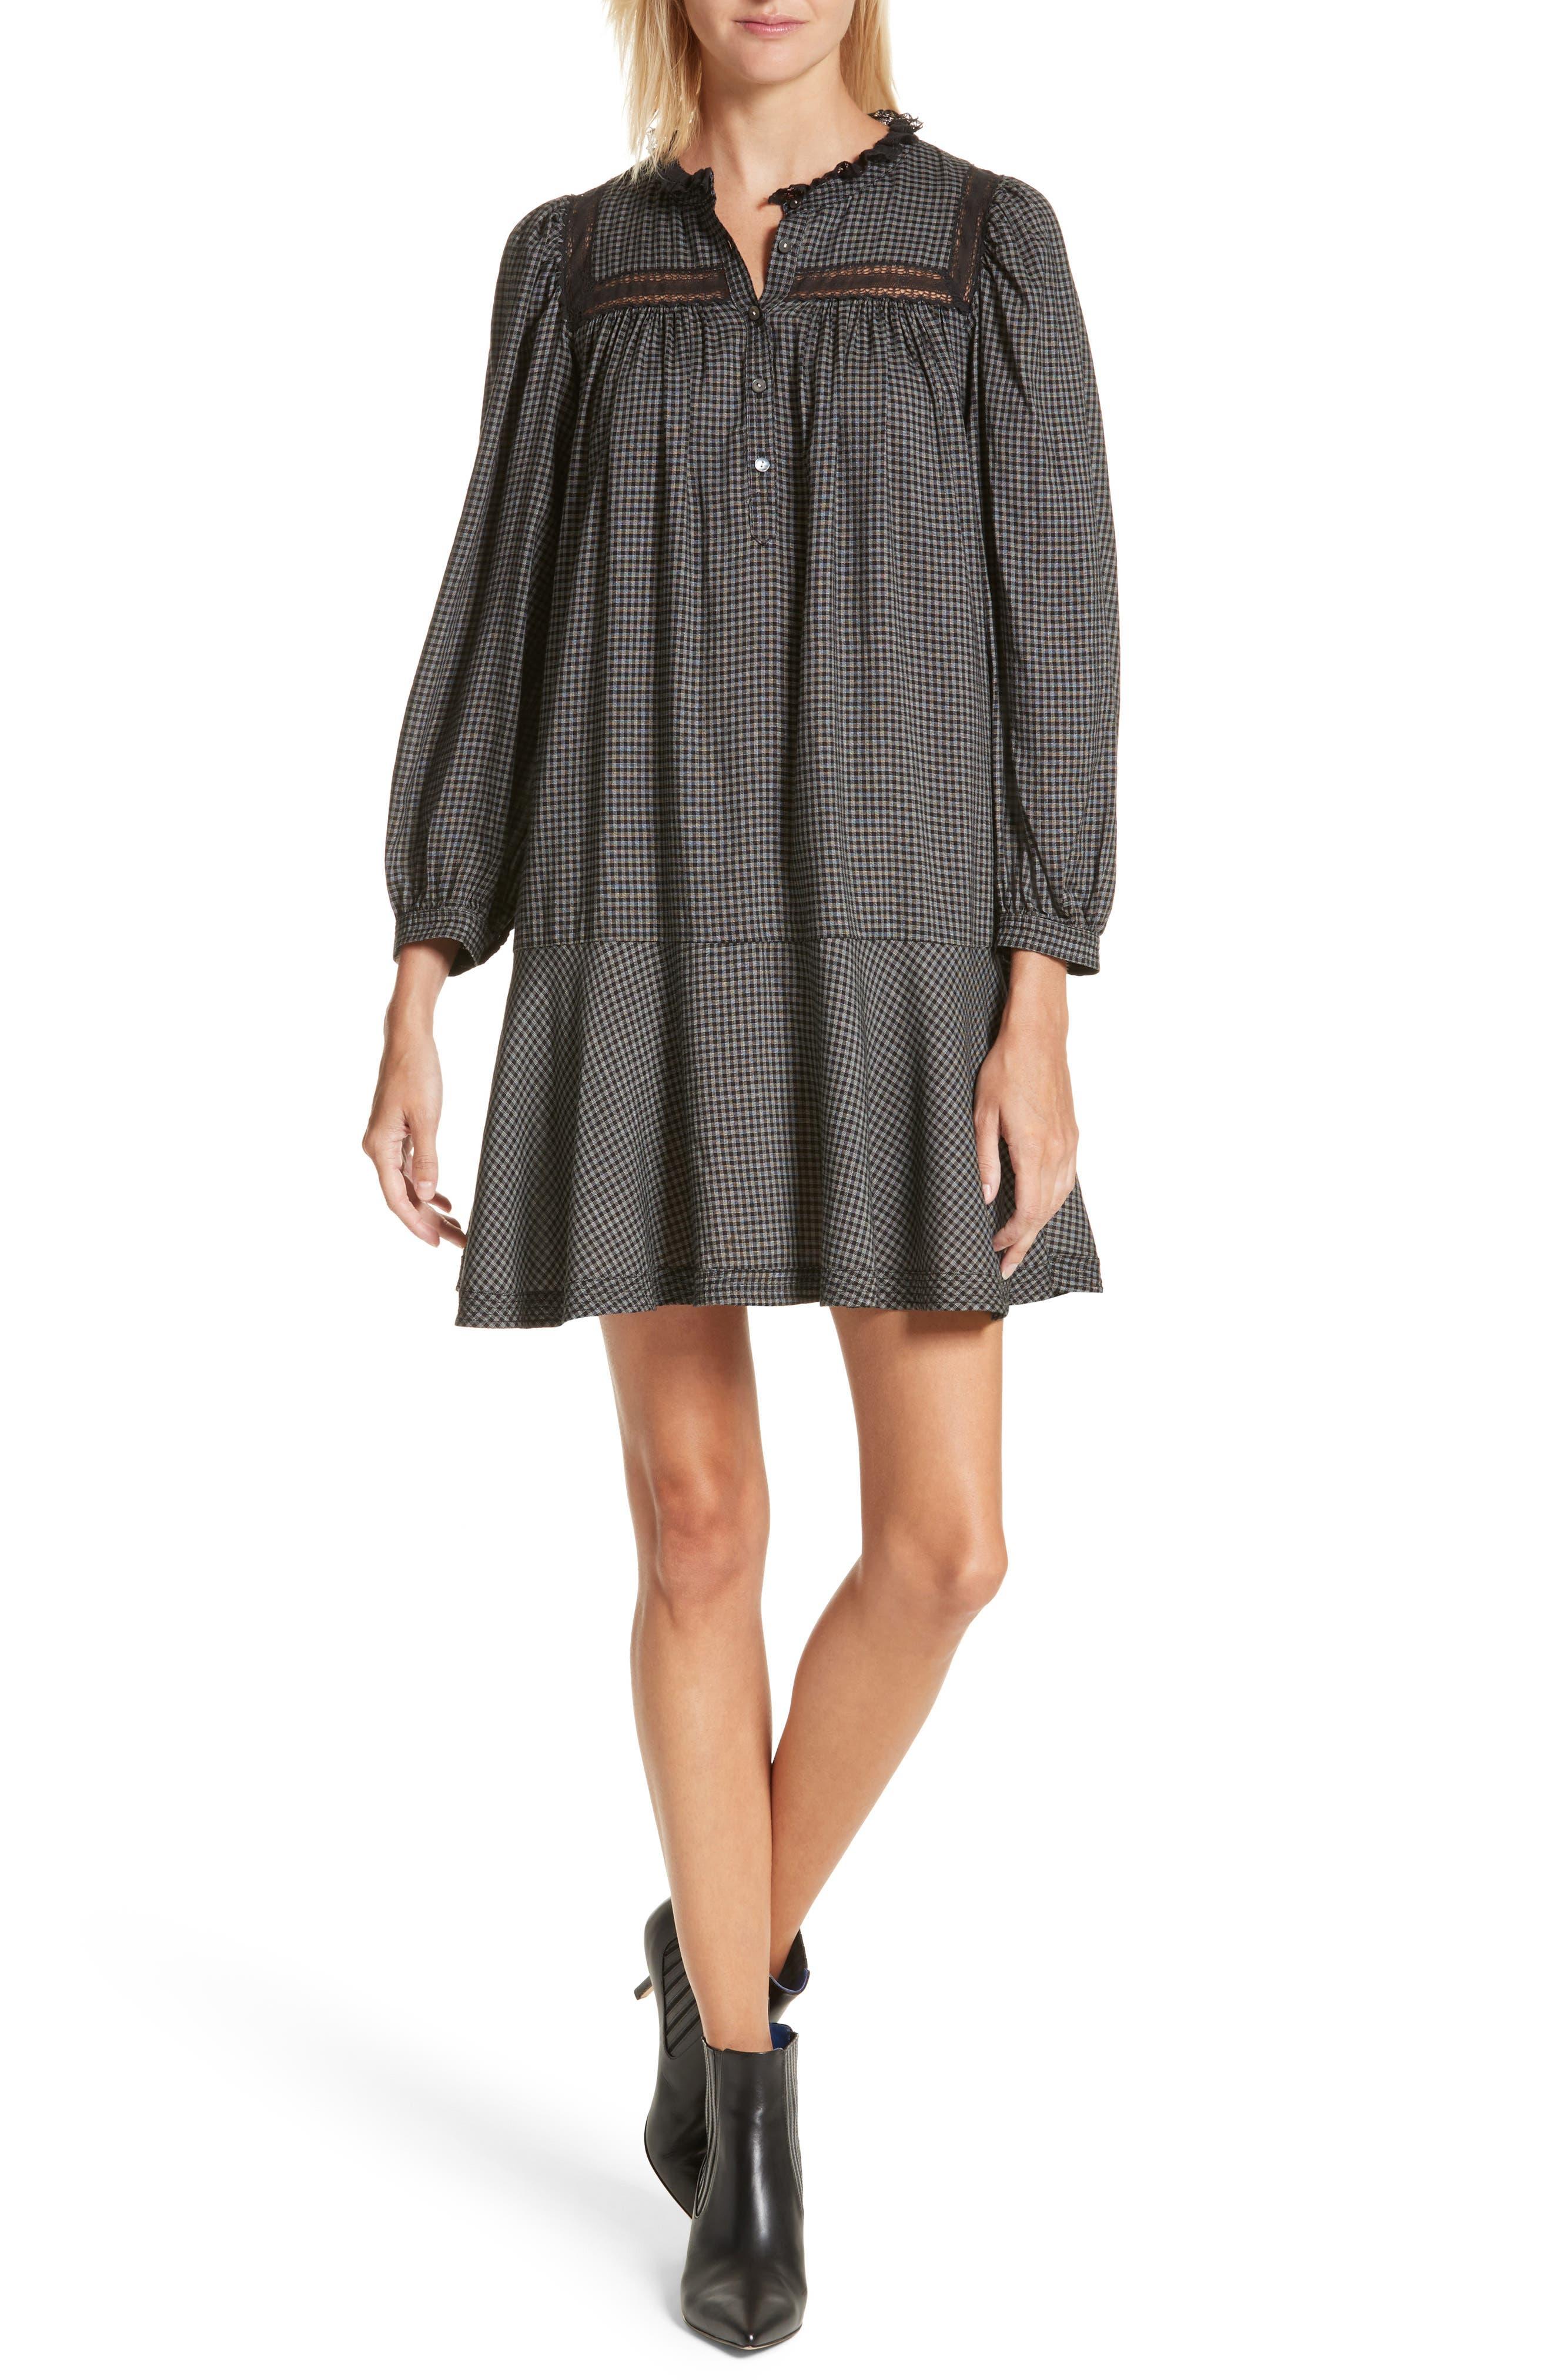 Alternate Image 1 Selected - La Vie Rebecca Taylor Drop Waist Plaid Dress